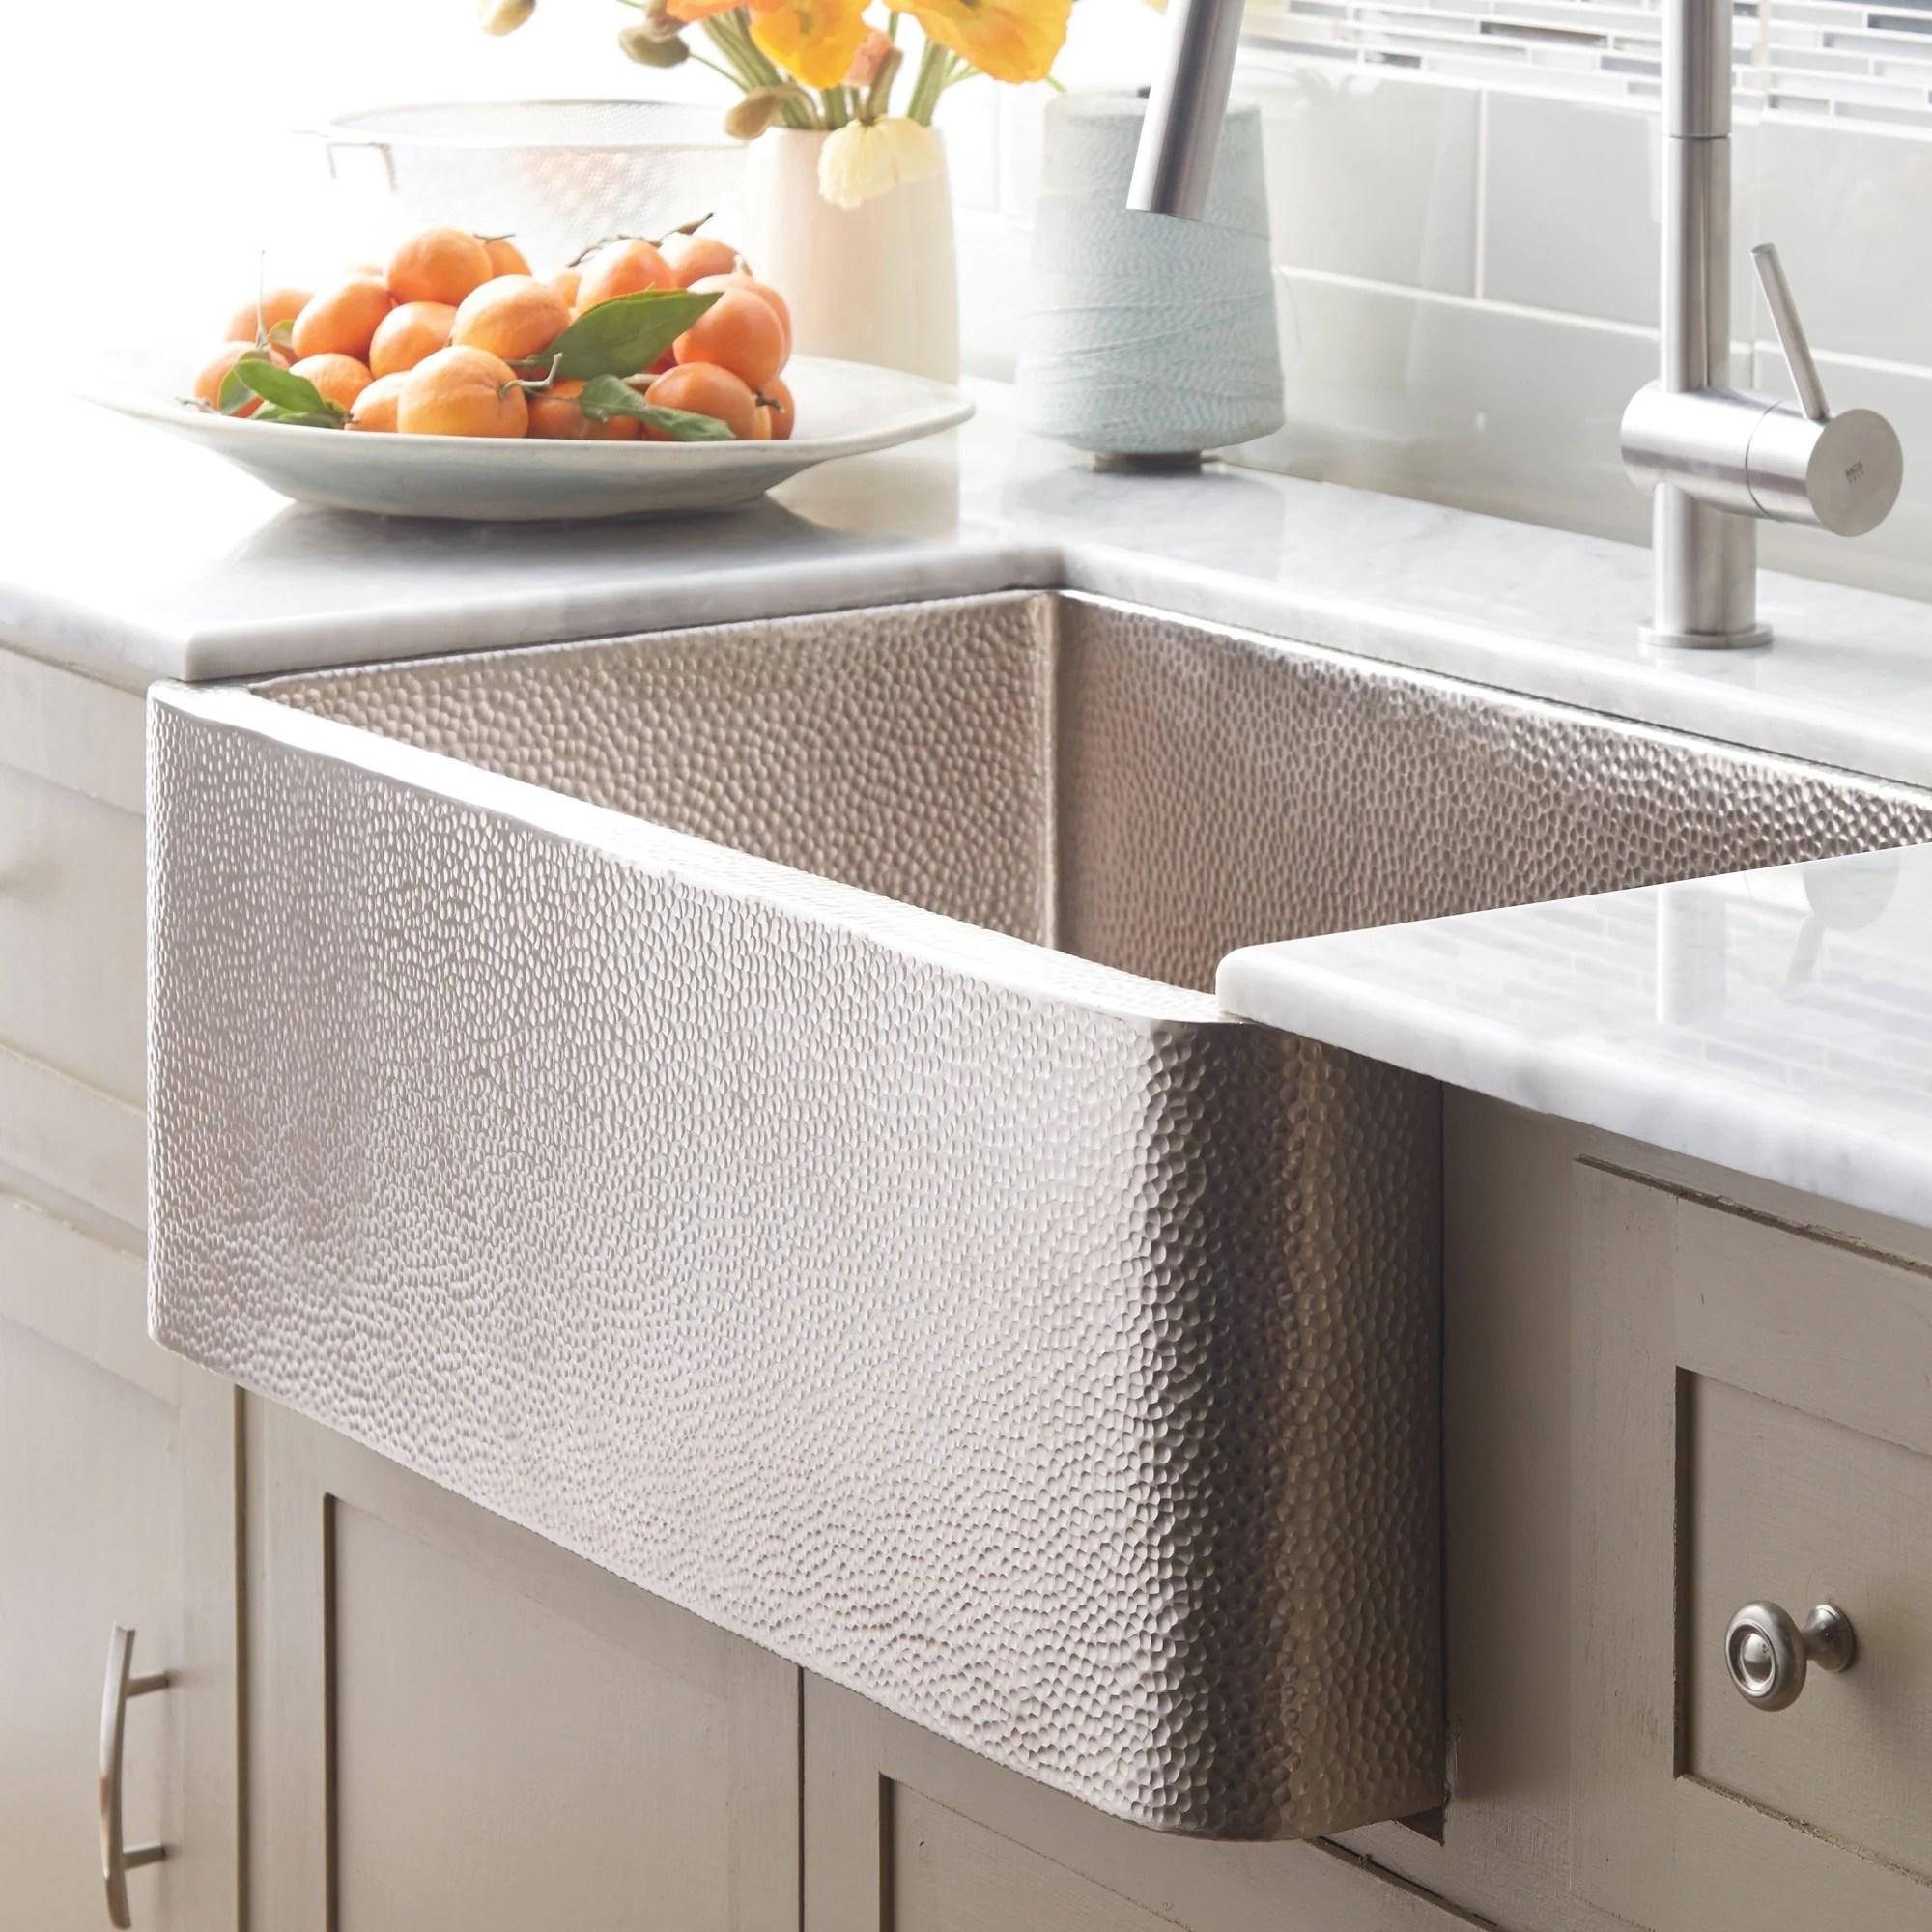 farmhouse brushed nickel 30 inch undermount apron front kitchen sink 30 x 18 5 x 10